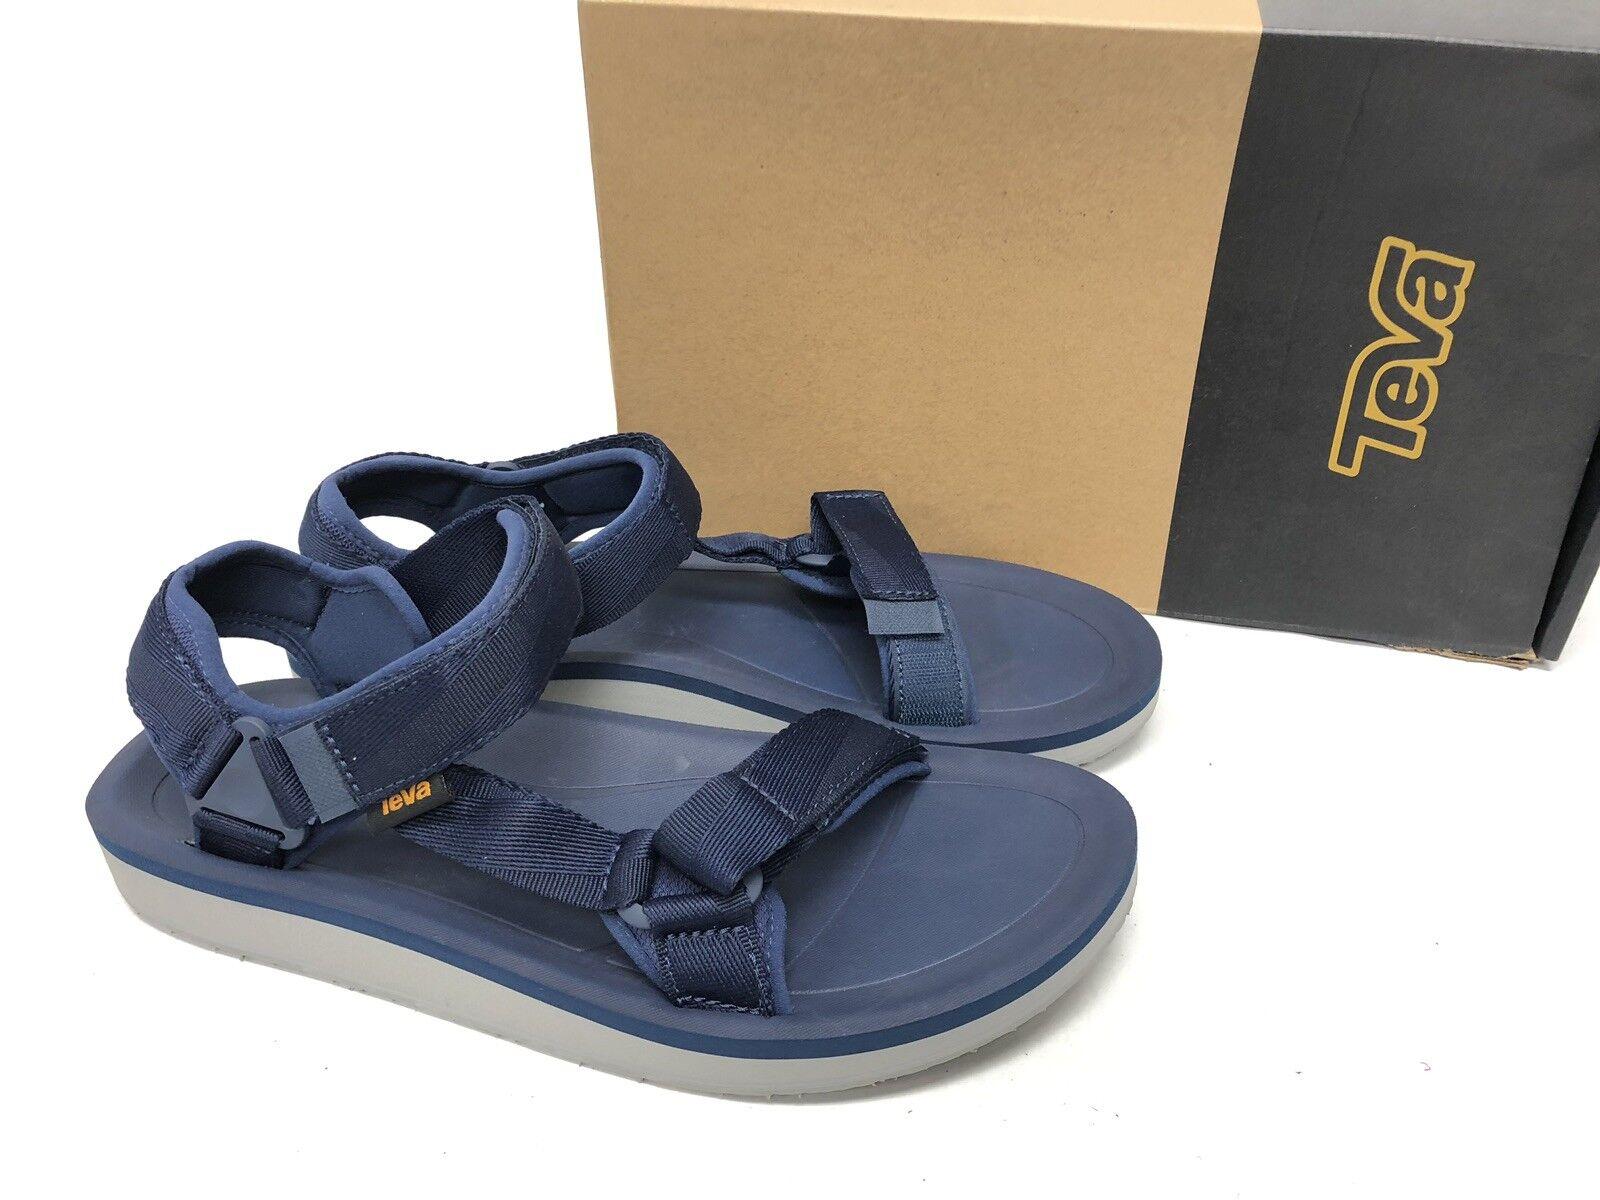 Teva Original Universal Premier Navy Blue Shoes Ankle Strap Outdoor 1015192